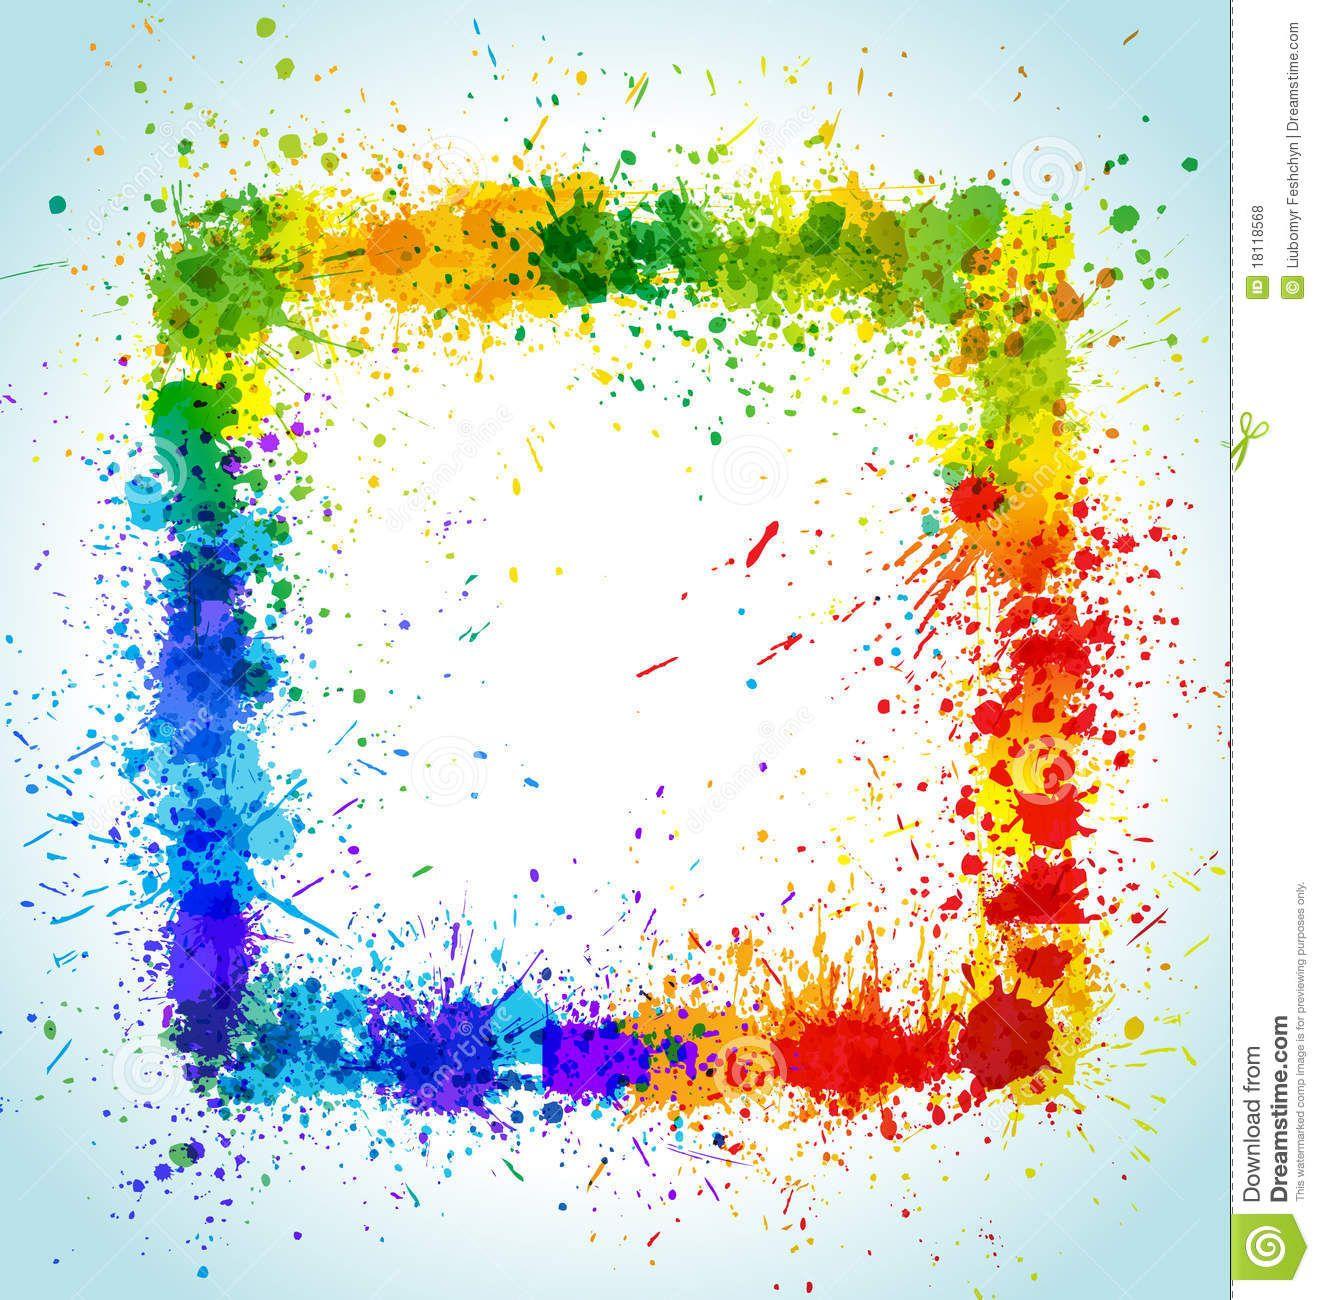 494059021603650545 on Pinterest Media Cabi